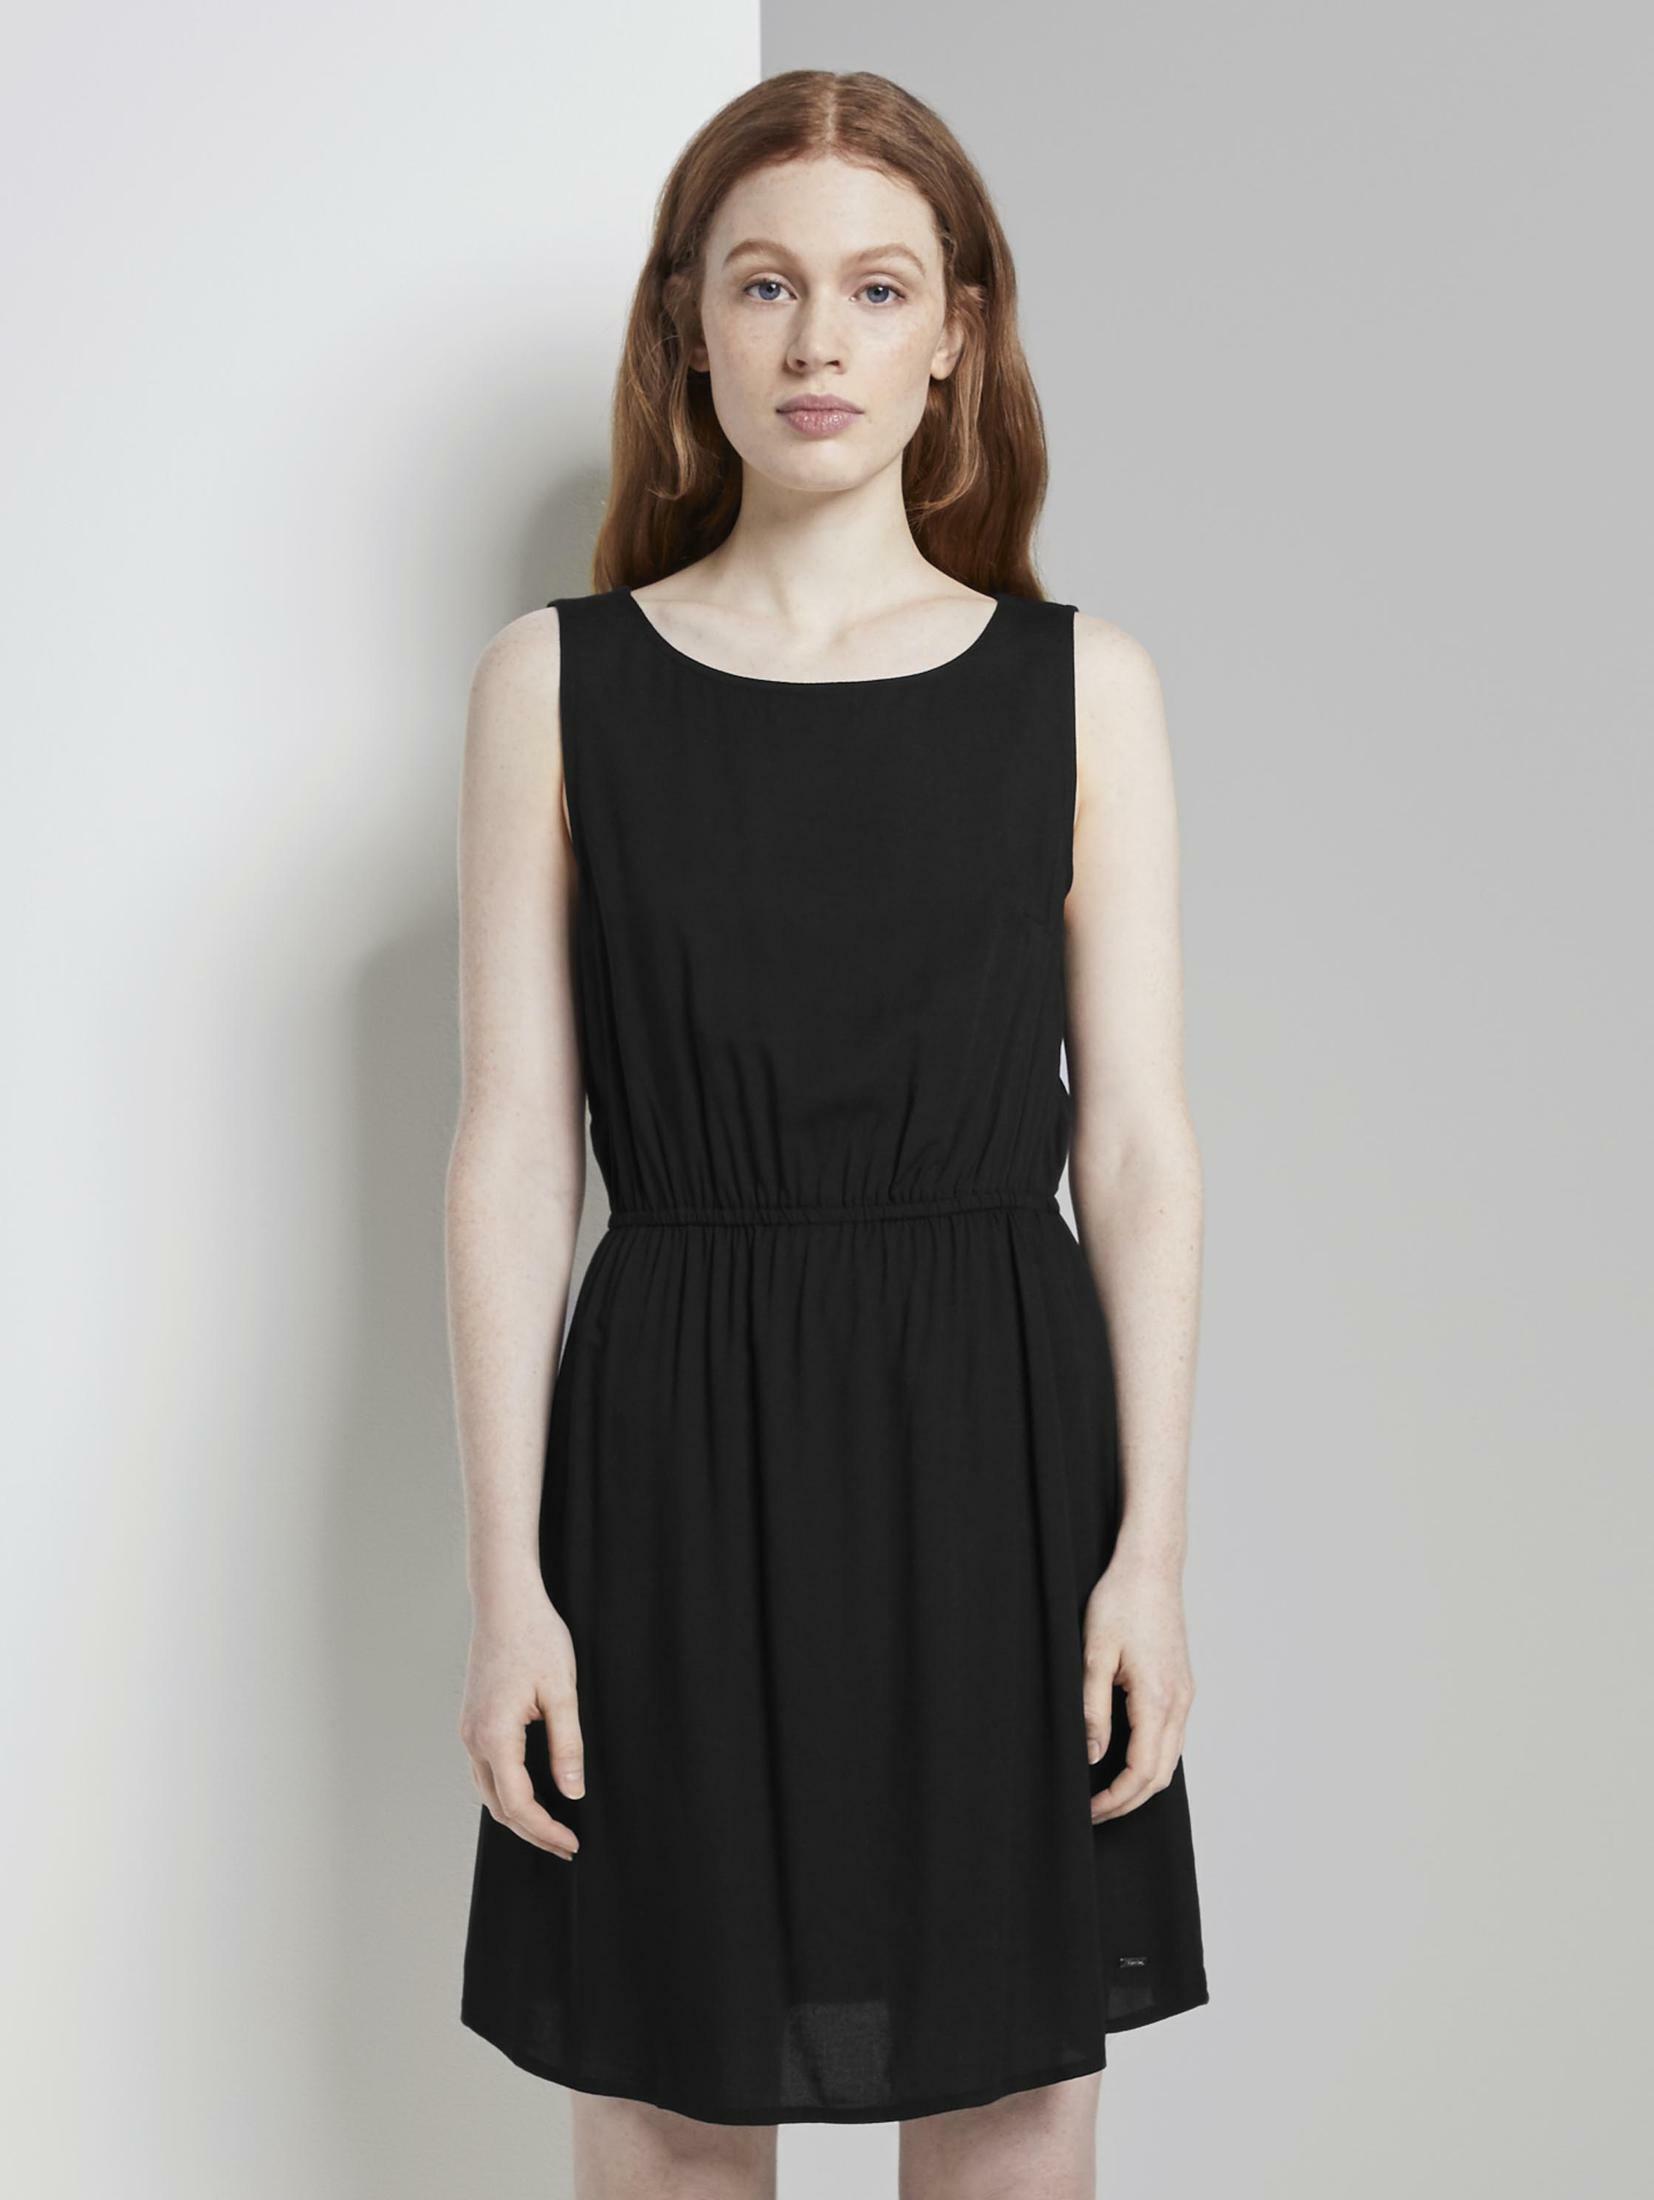 TOM TAILOR Denim Minikleid Basic Minikleid mit Rückendetail Damenmode/Bekleidung/Kleider/Minikleider